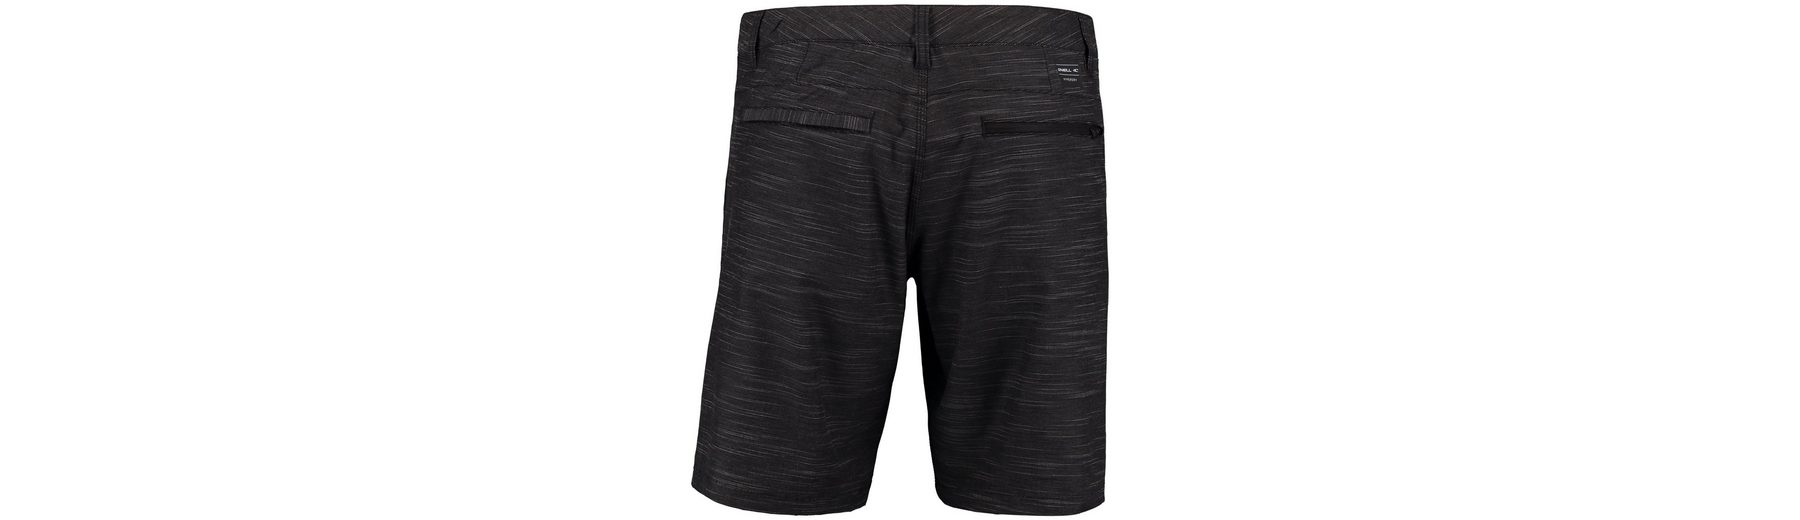 O'Neill Boardshorts Prevail hybrid shorts Günstigste Online-Verkauf t5eLAx5